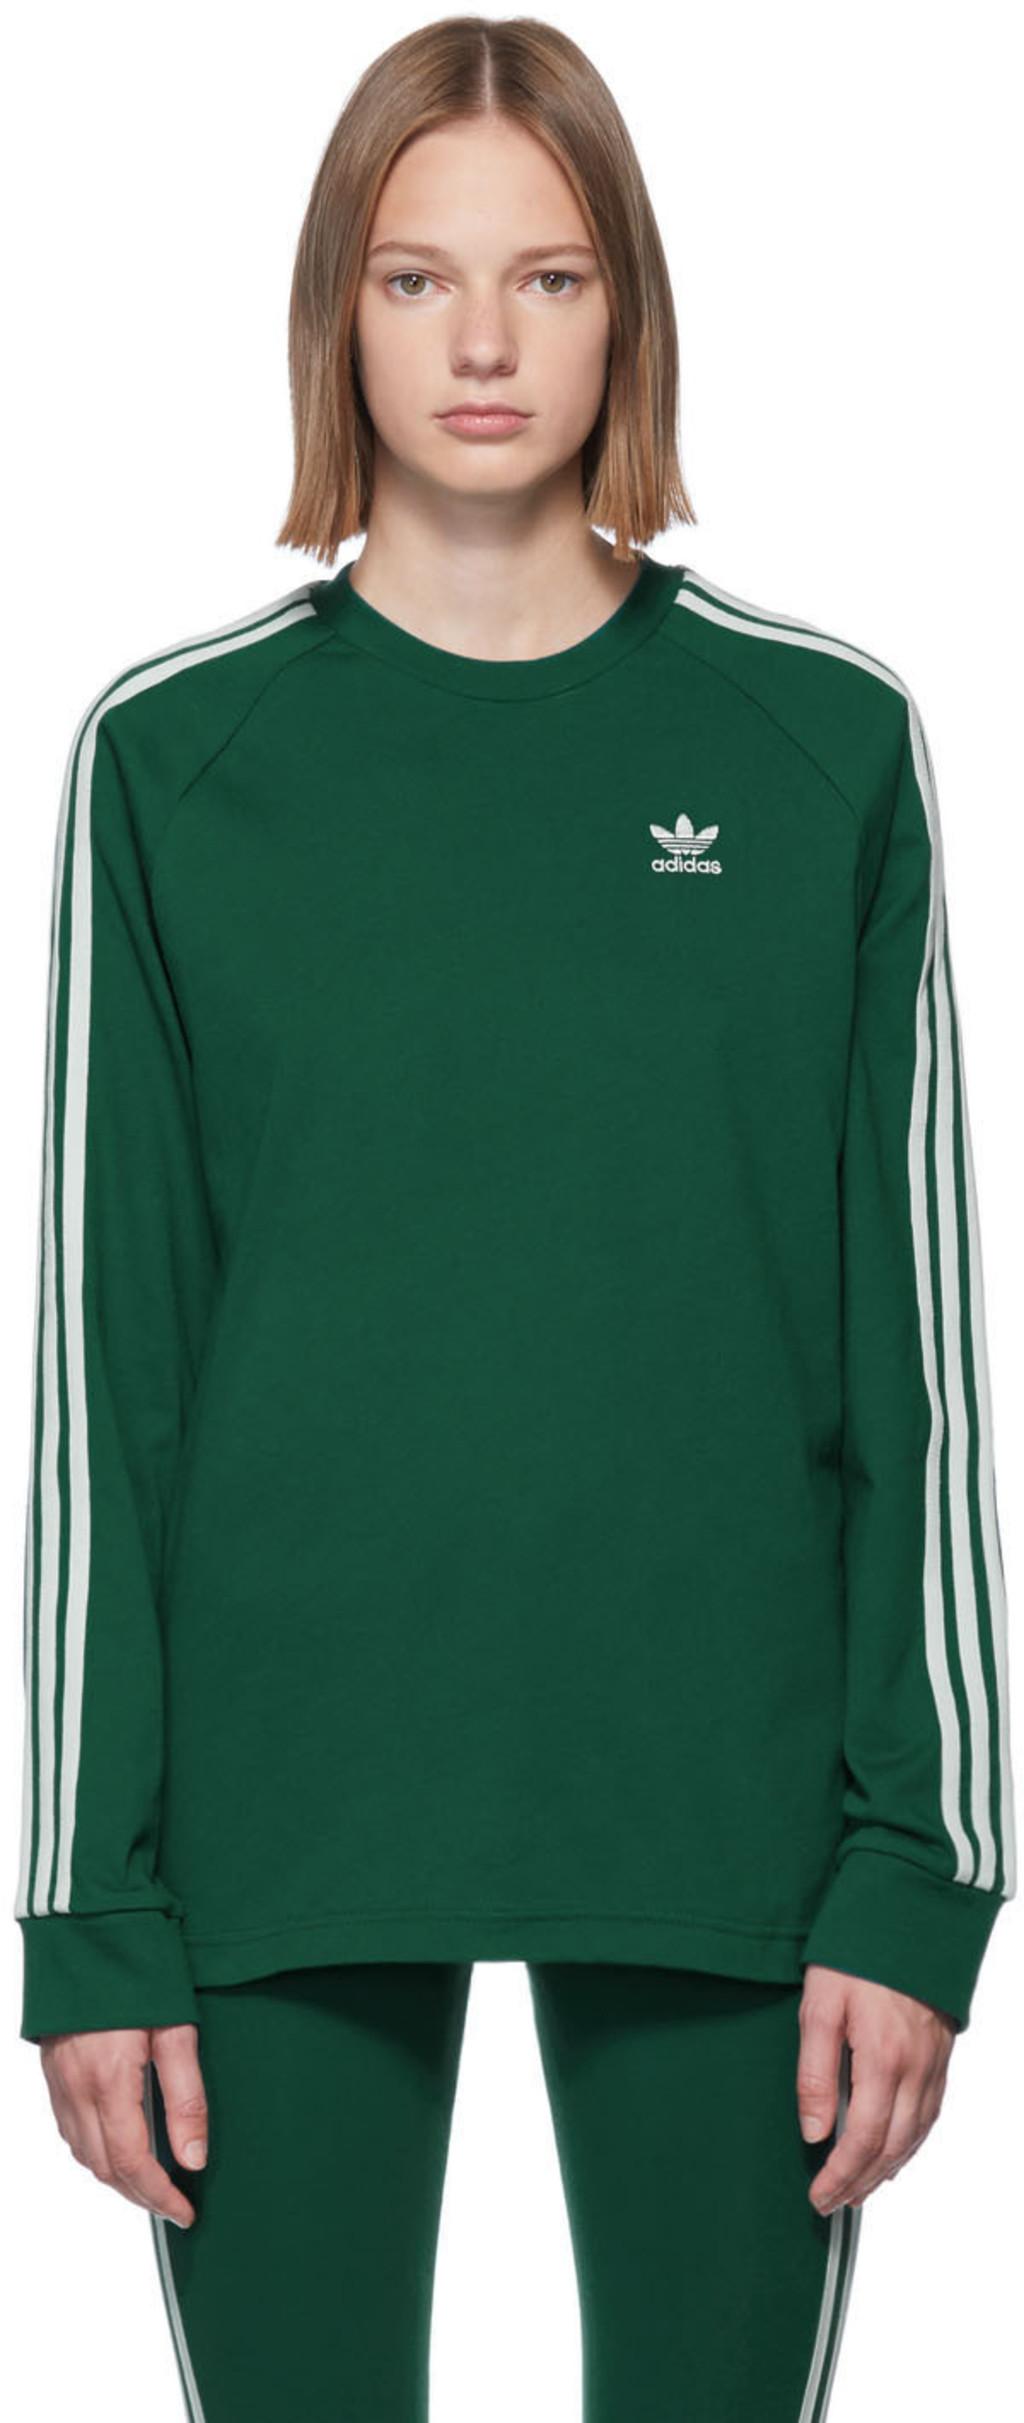 8bccaddd Green 3-Stripe Long Sleeve T-Shirt